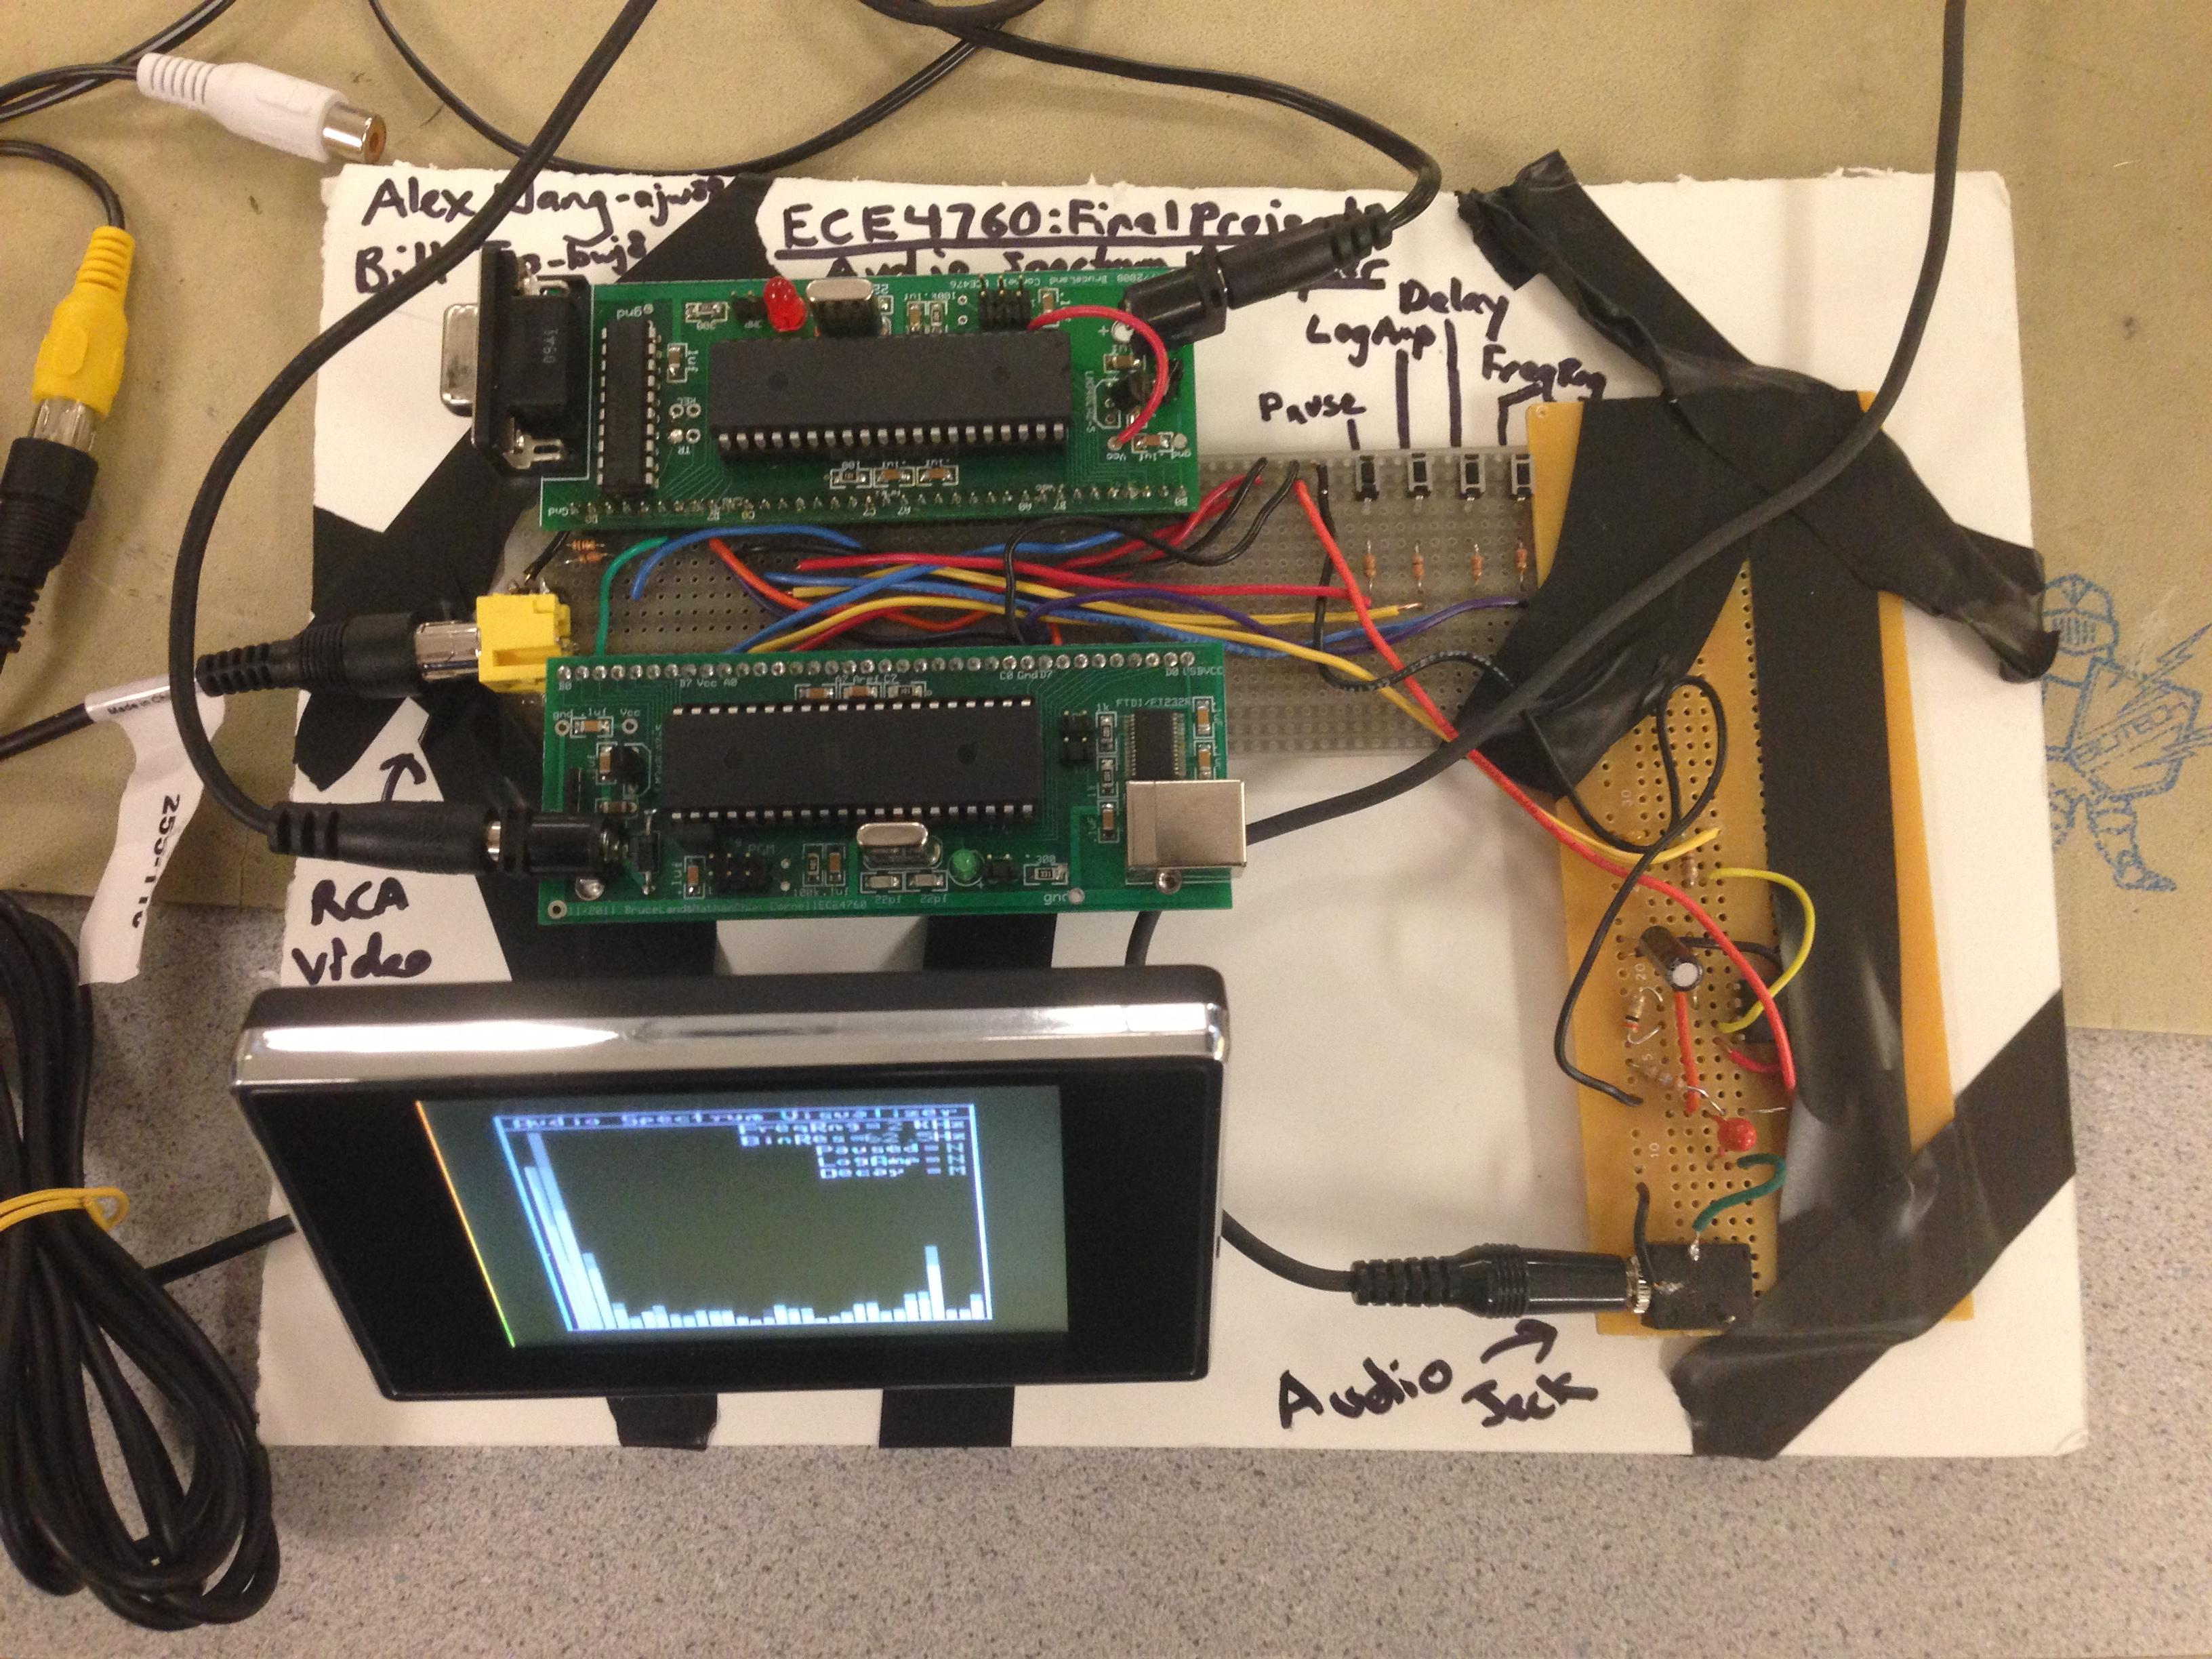 audio spectrum analyzer circuit diagram kenworth t660 headlight wiring ece 4760